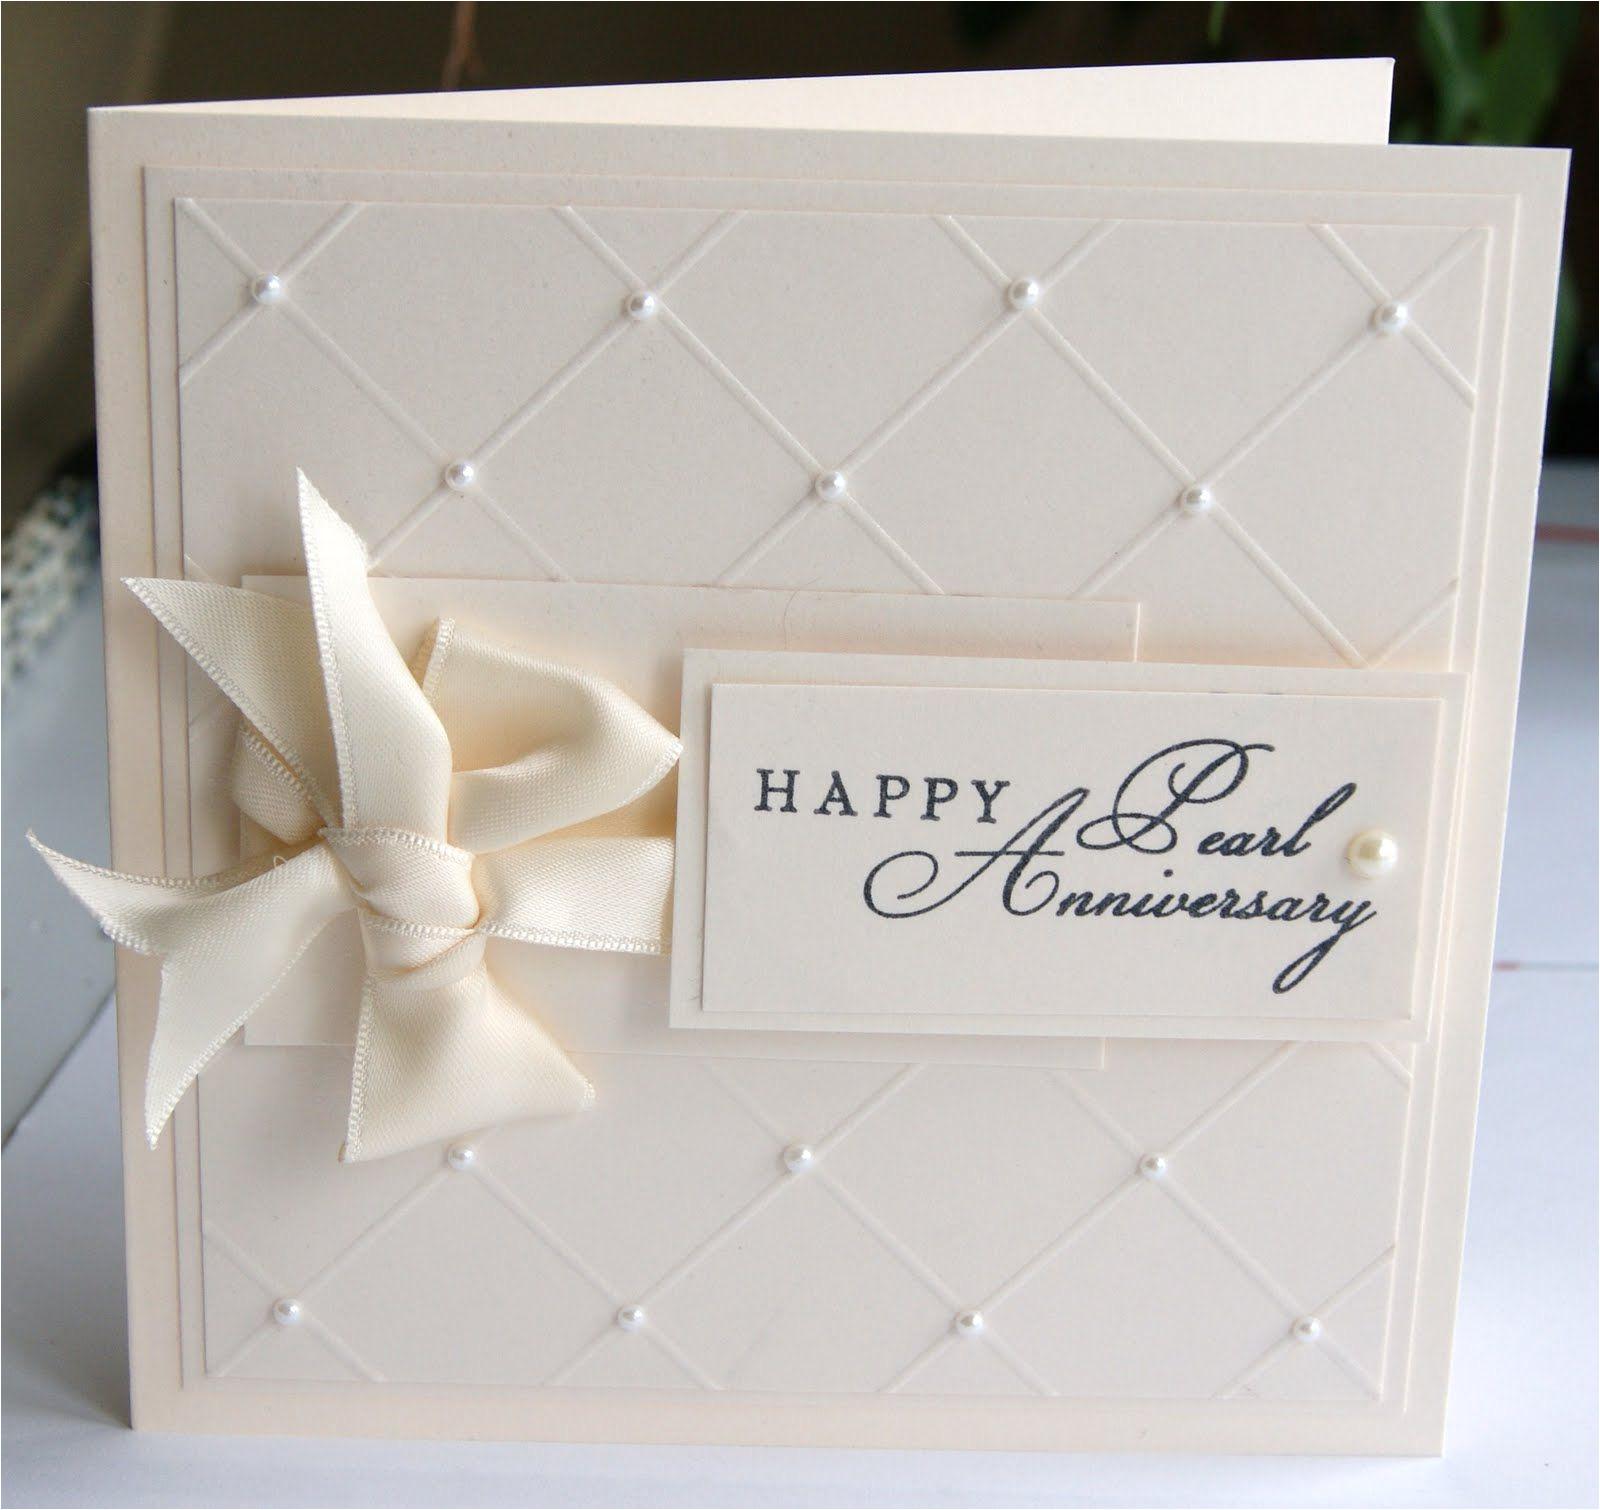 60th wedding anniversary queen card  williamsonga